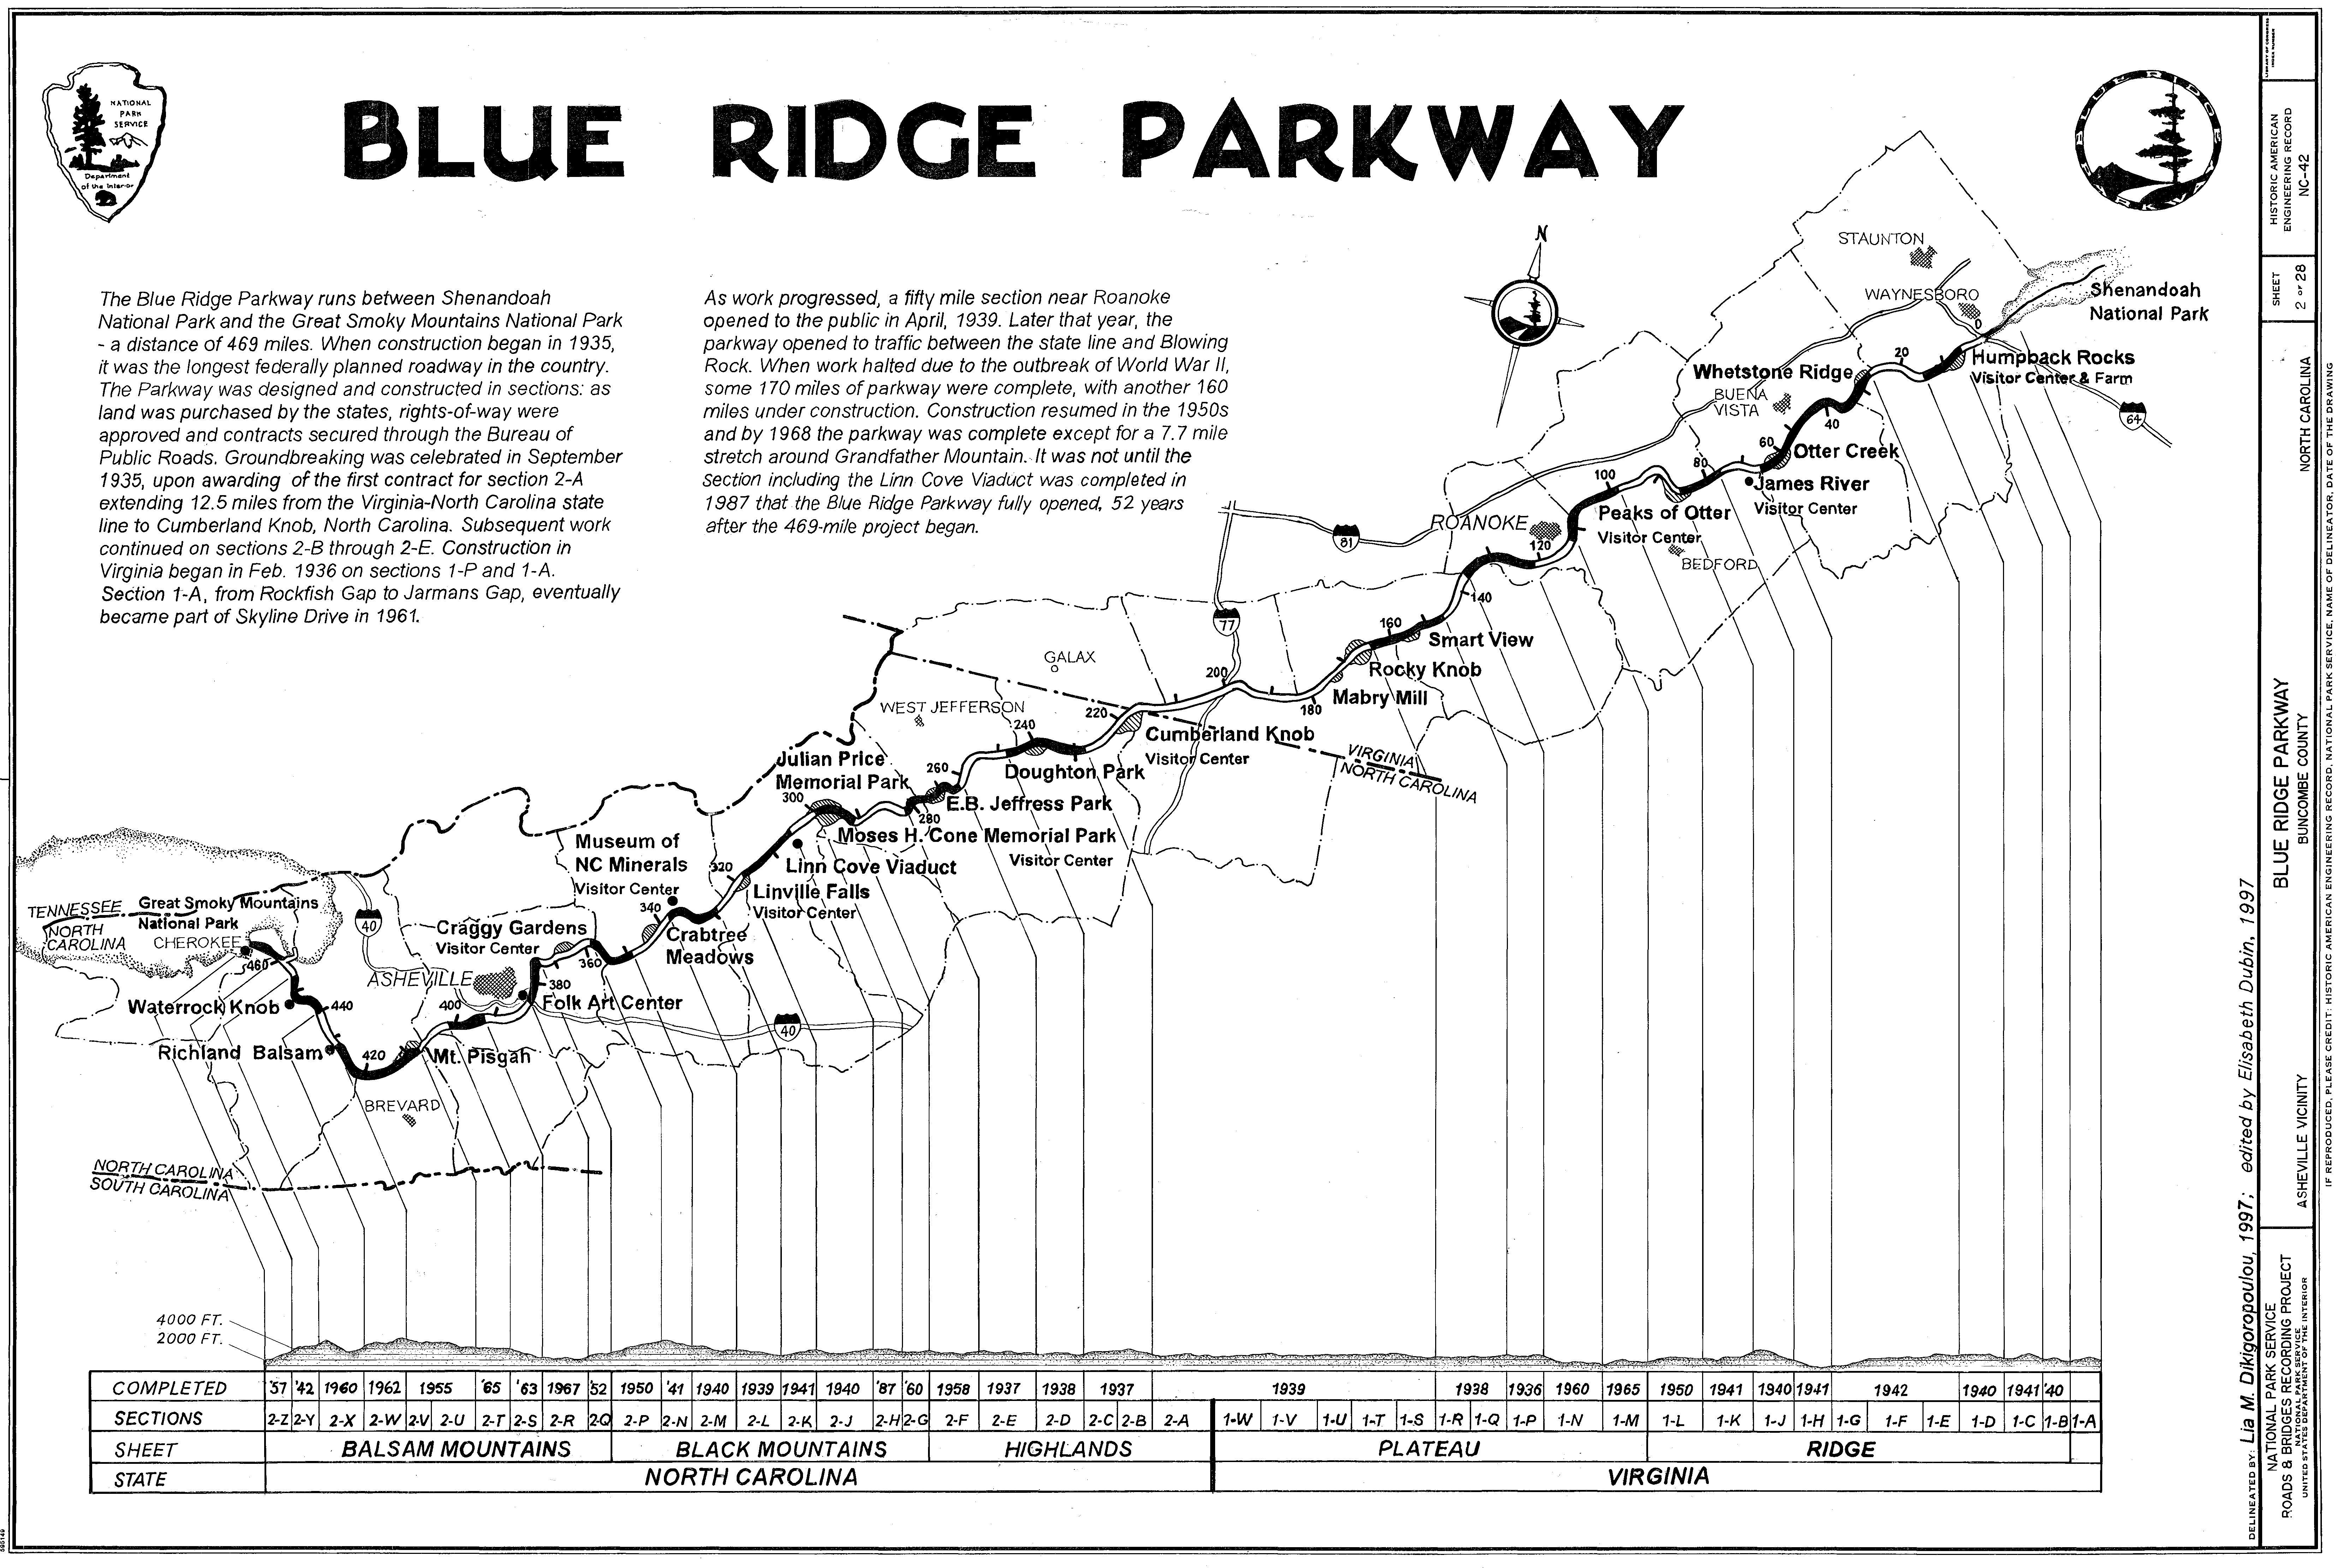 Trail Maps Wiki Blue Ridge Parkway